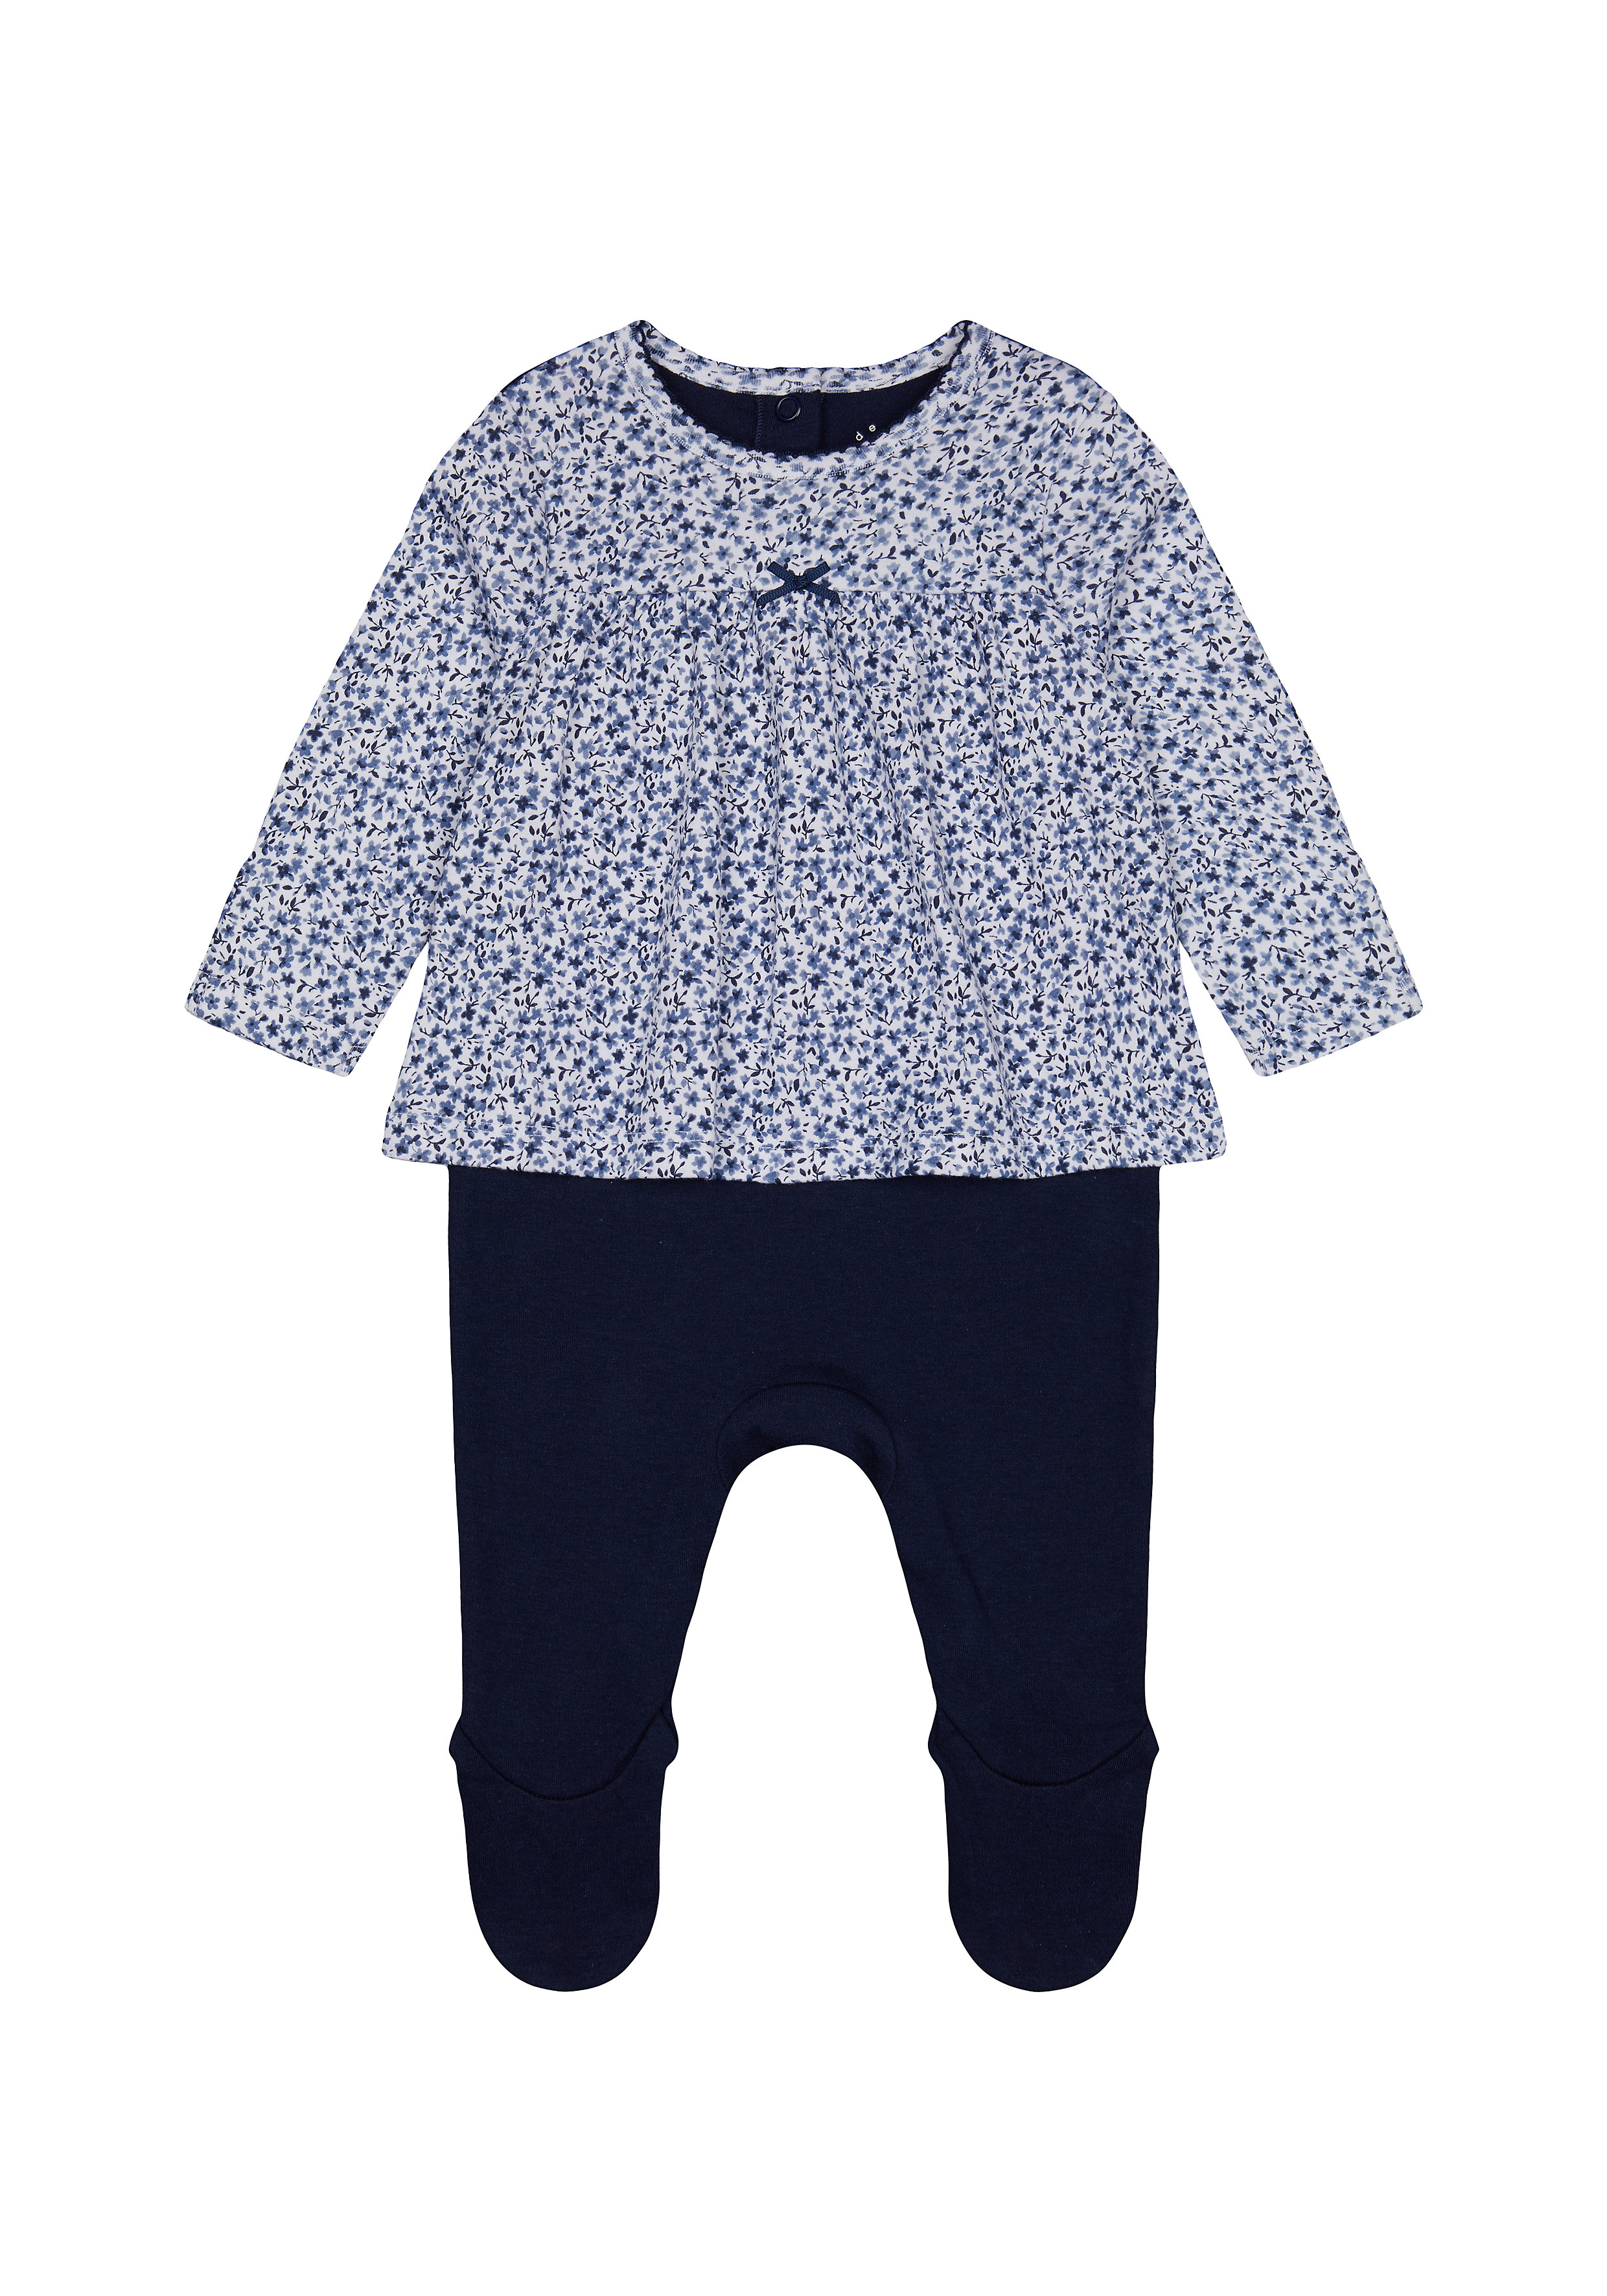 Mothercare | Girls Full Sleeves Mock Romper Floral Print - Navy